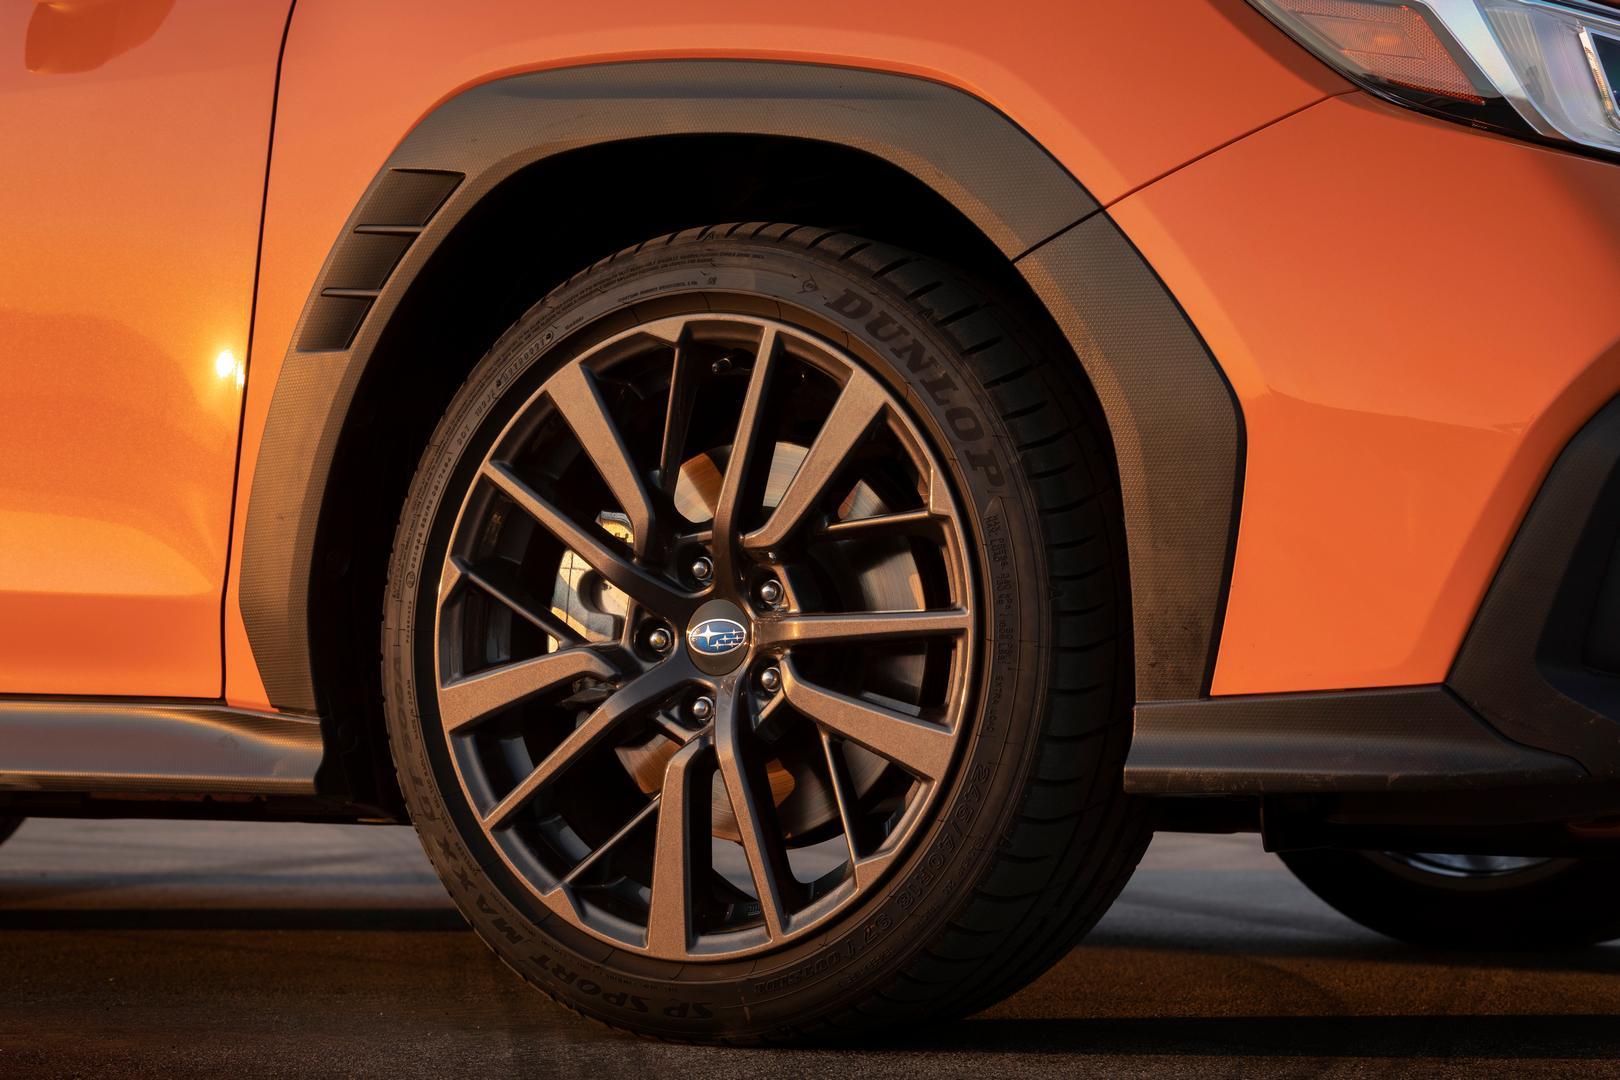 2022 Subaru WRX fender flares